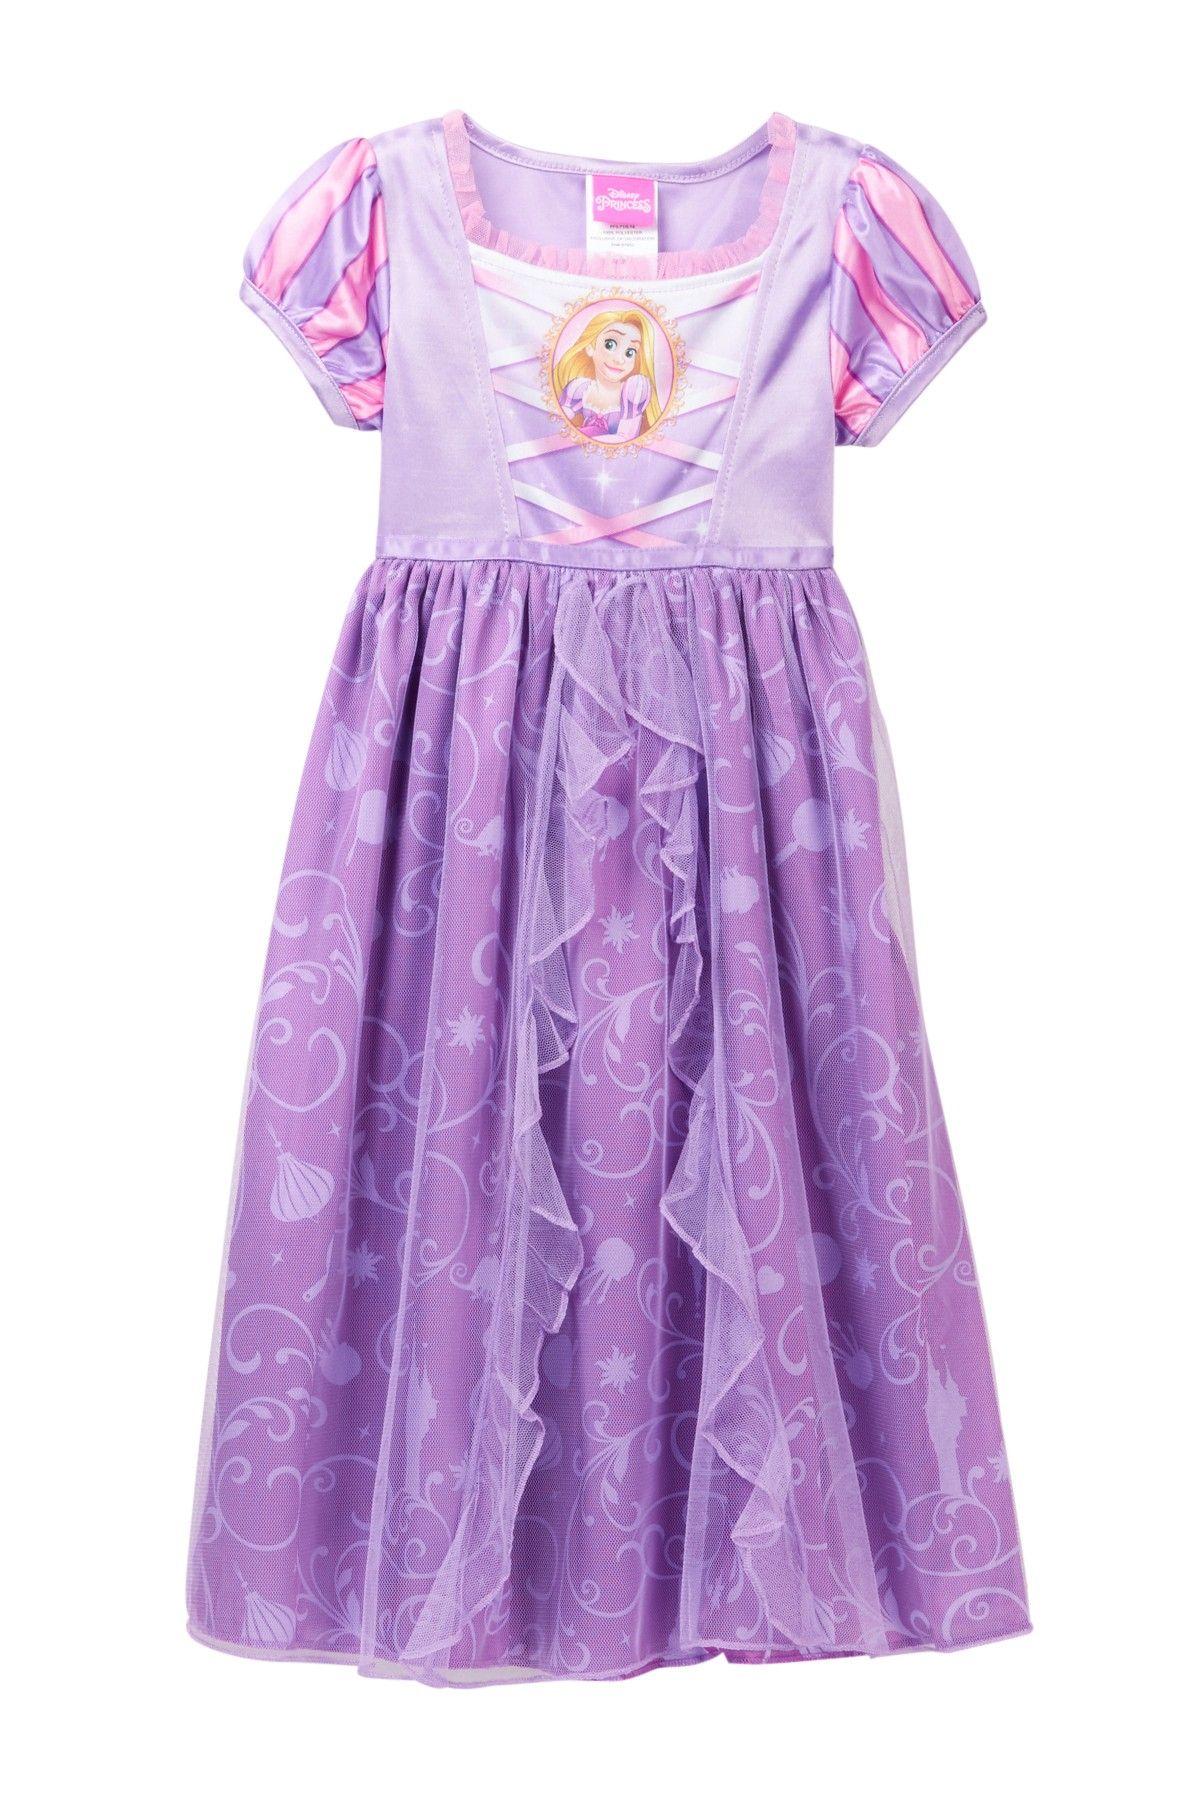 Tangled Rapunzel Fantasy Nightgown (Little Girls   Big Girls ... 2d47190b9